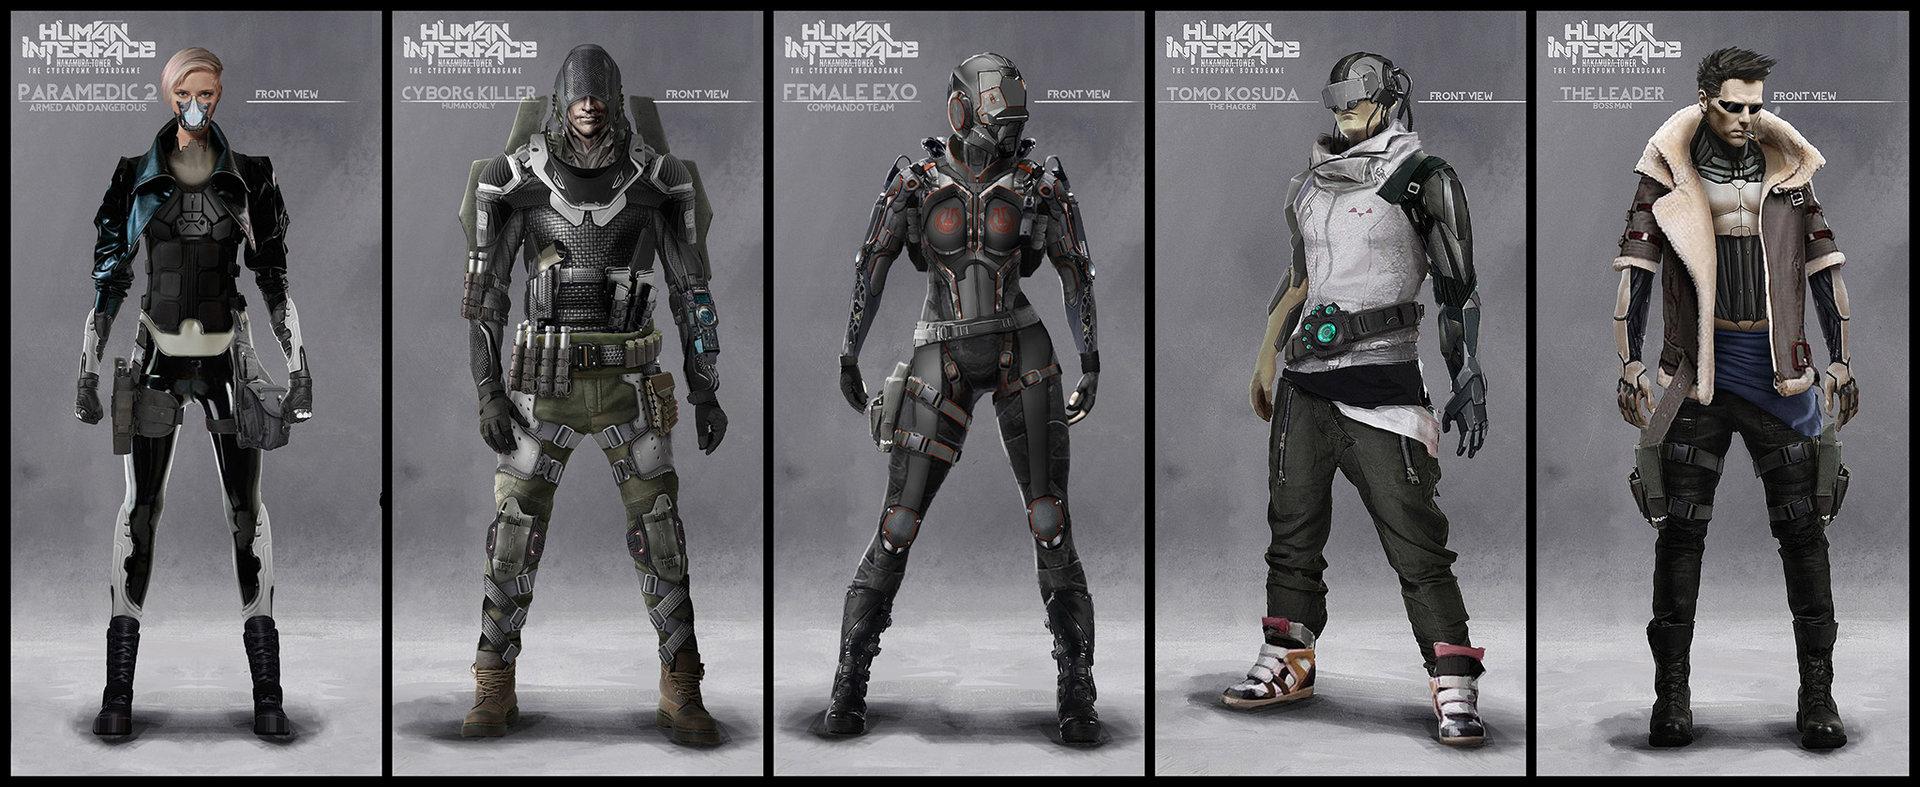 ArtStation - Human Interface - Character concept art, Darius ...